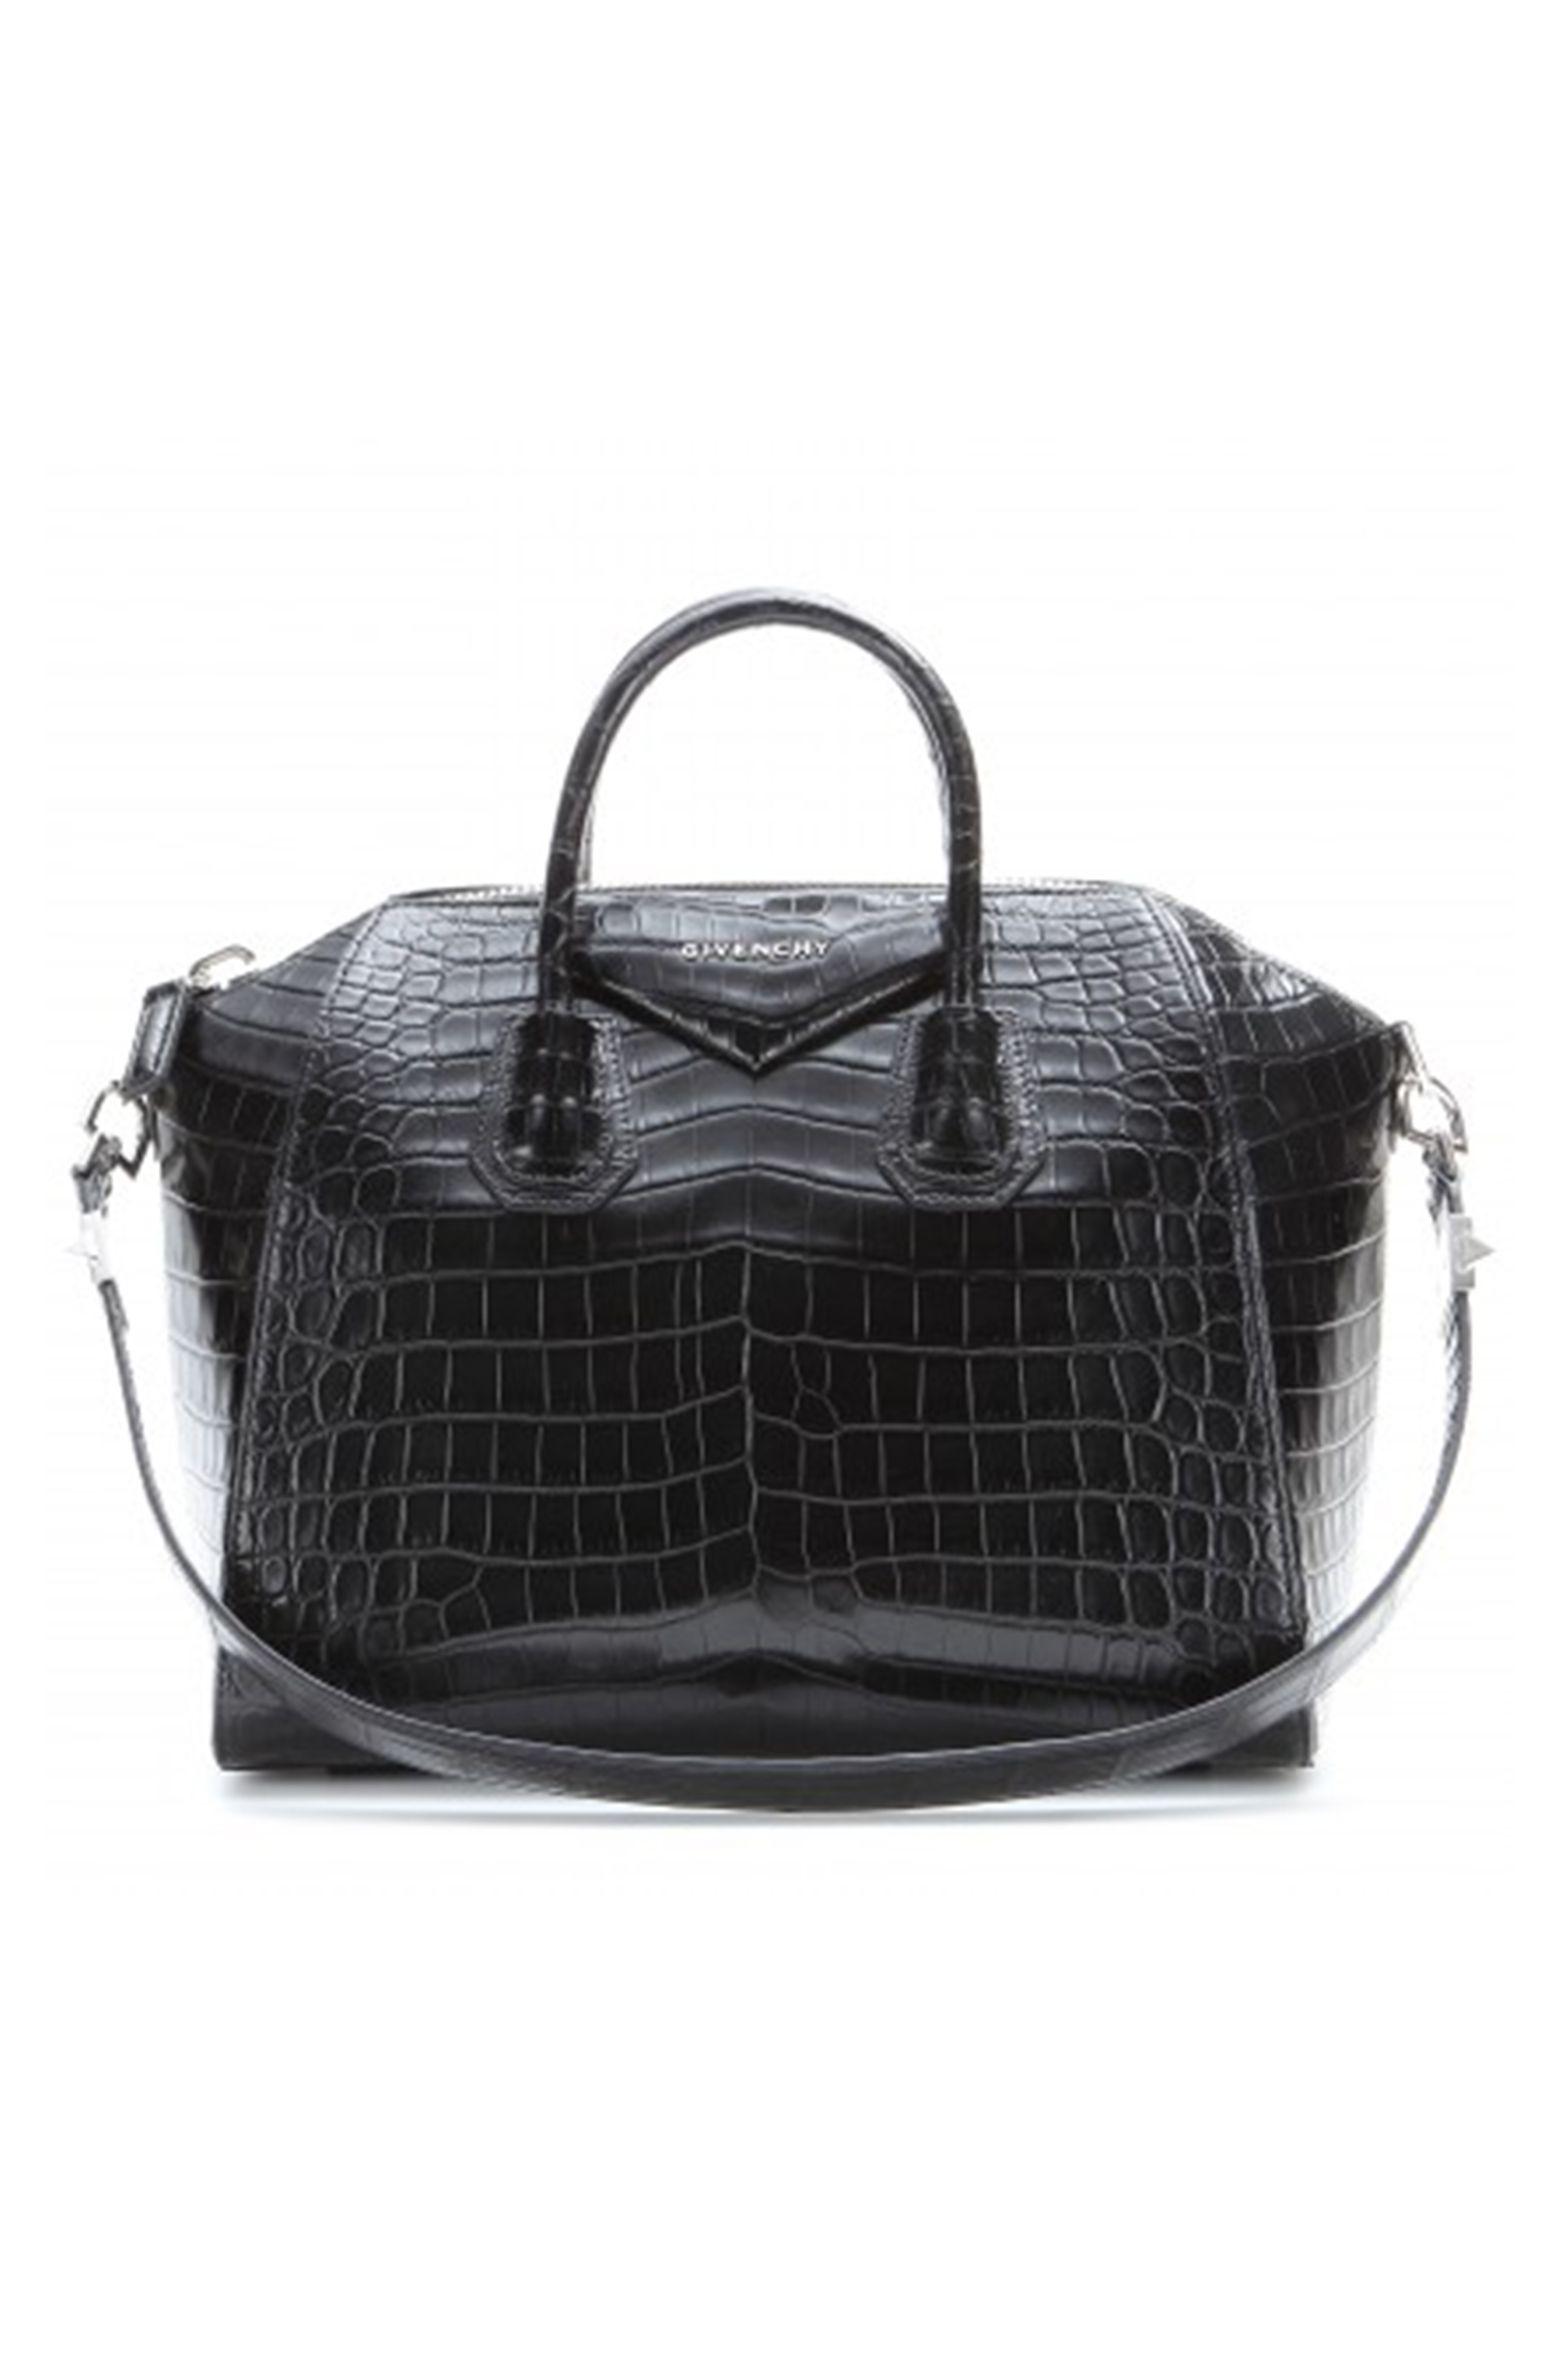 9c209d51ee6f Givenchy Antigona croco  . Givenchy Antigona croco   Black Leather Tote Bag  ...